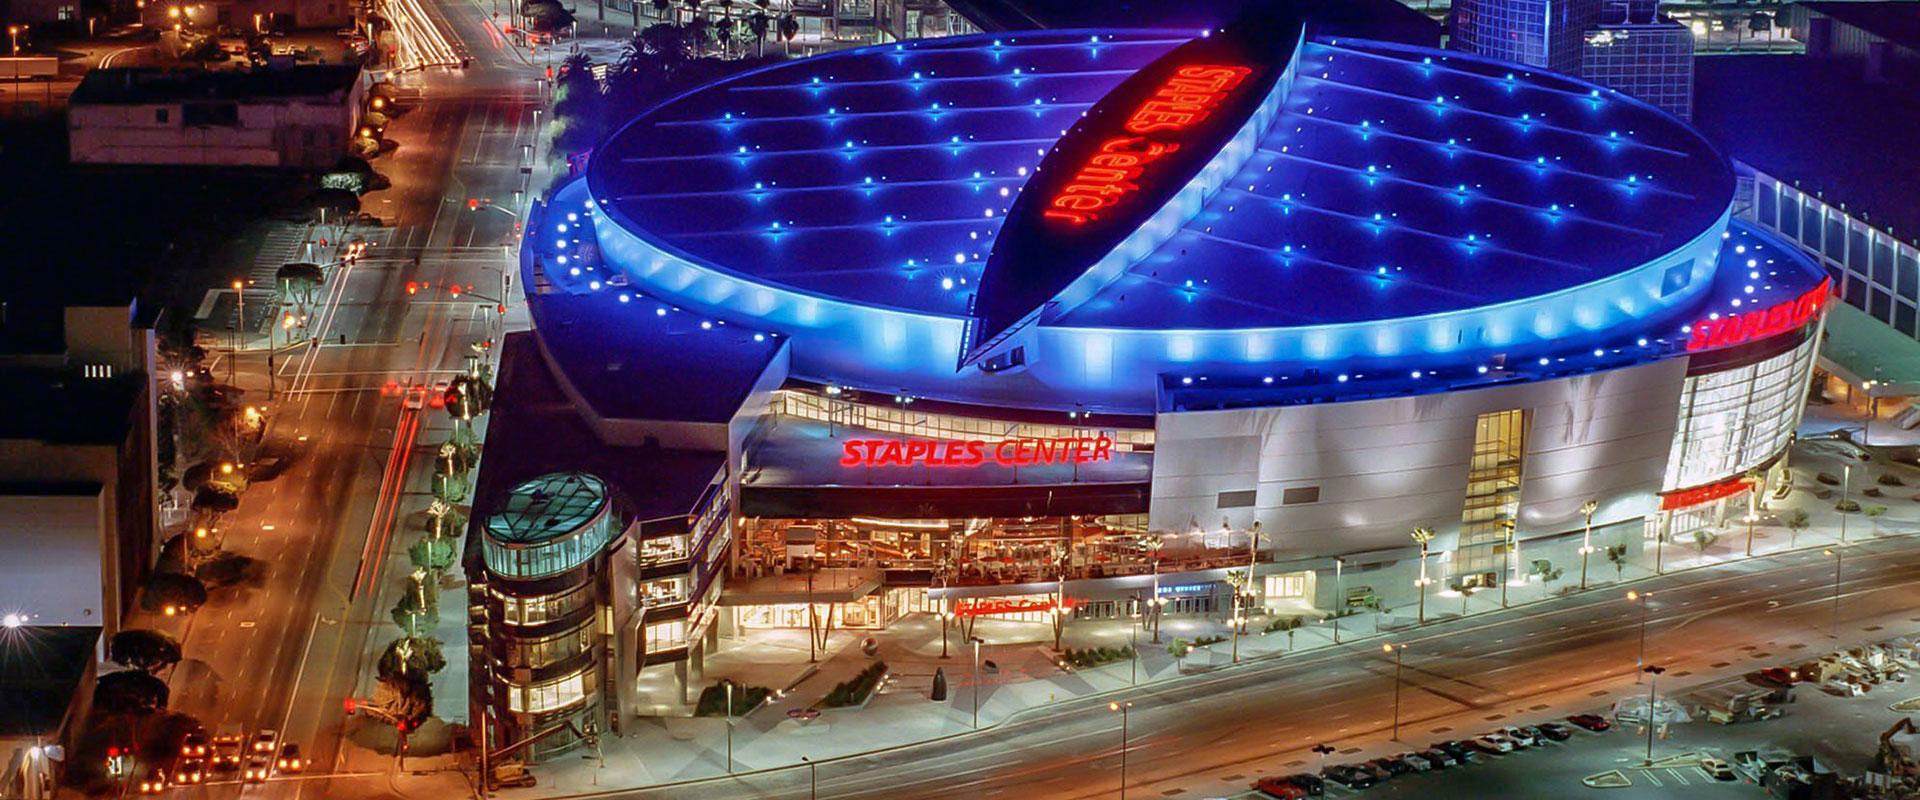 Tell City Indiana >> Staples Center | Los Angeles, CA - ACCO